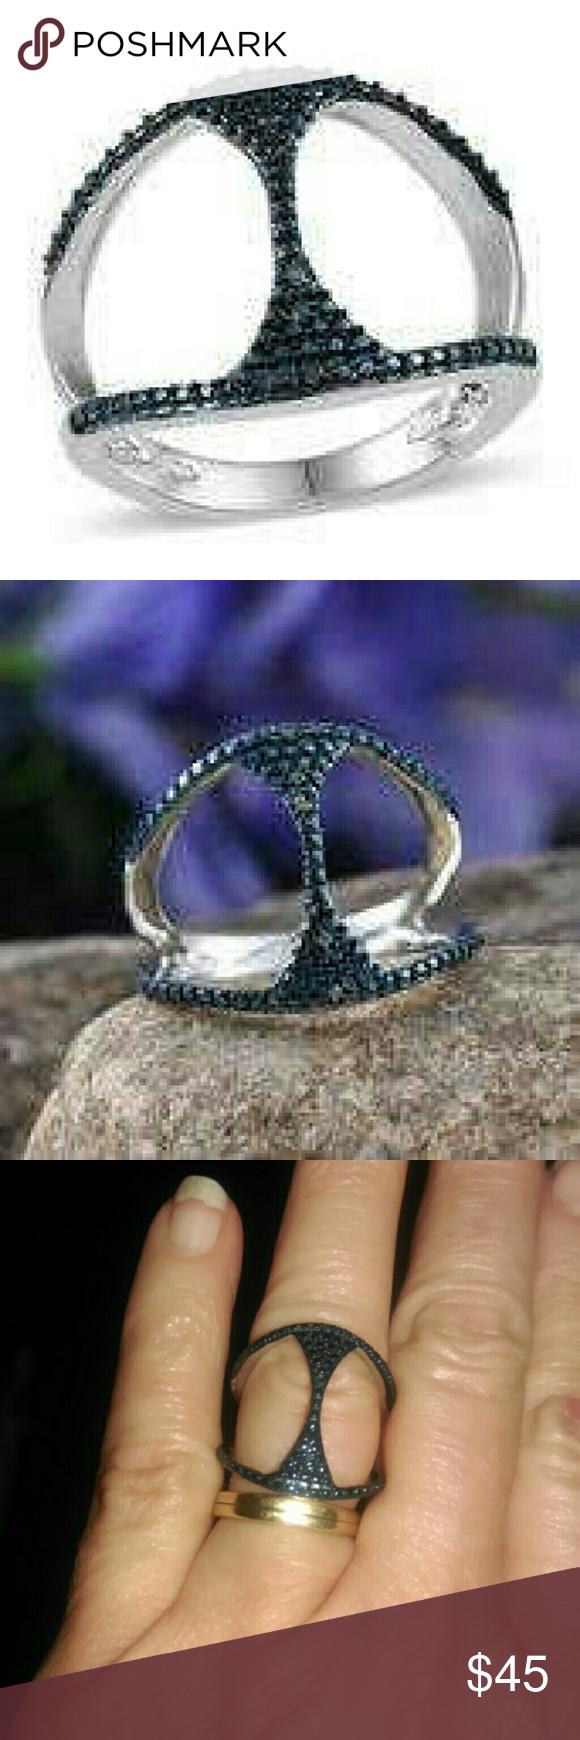 GENUINE BLUE DIAMOND RING-925-STERLING SILVER GENUINE BLUE DIAMOND RING SET IN PURE 925-STERLING SILVER/NICKEL FREE Jewelry Rings